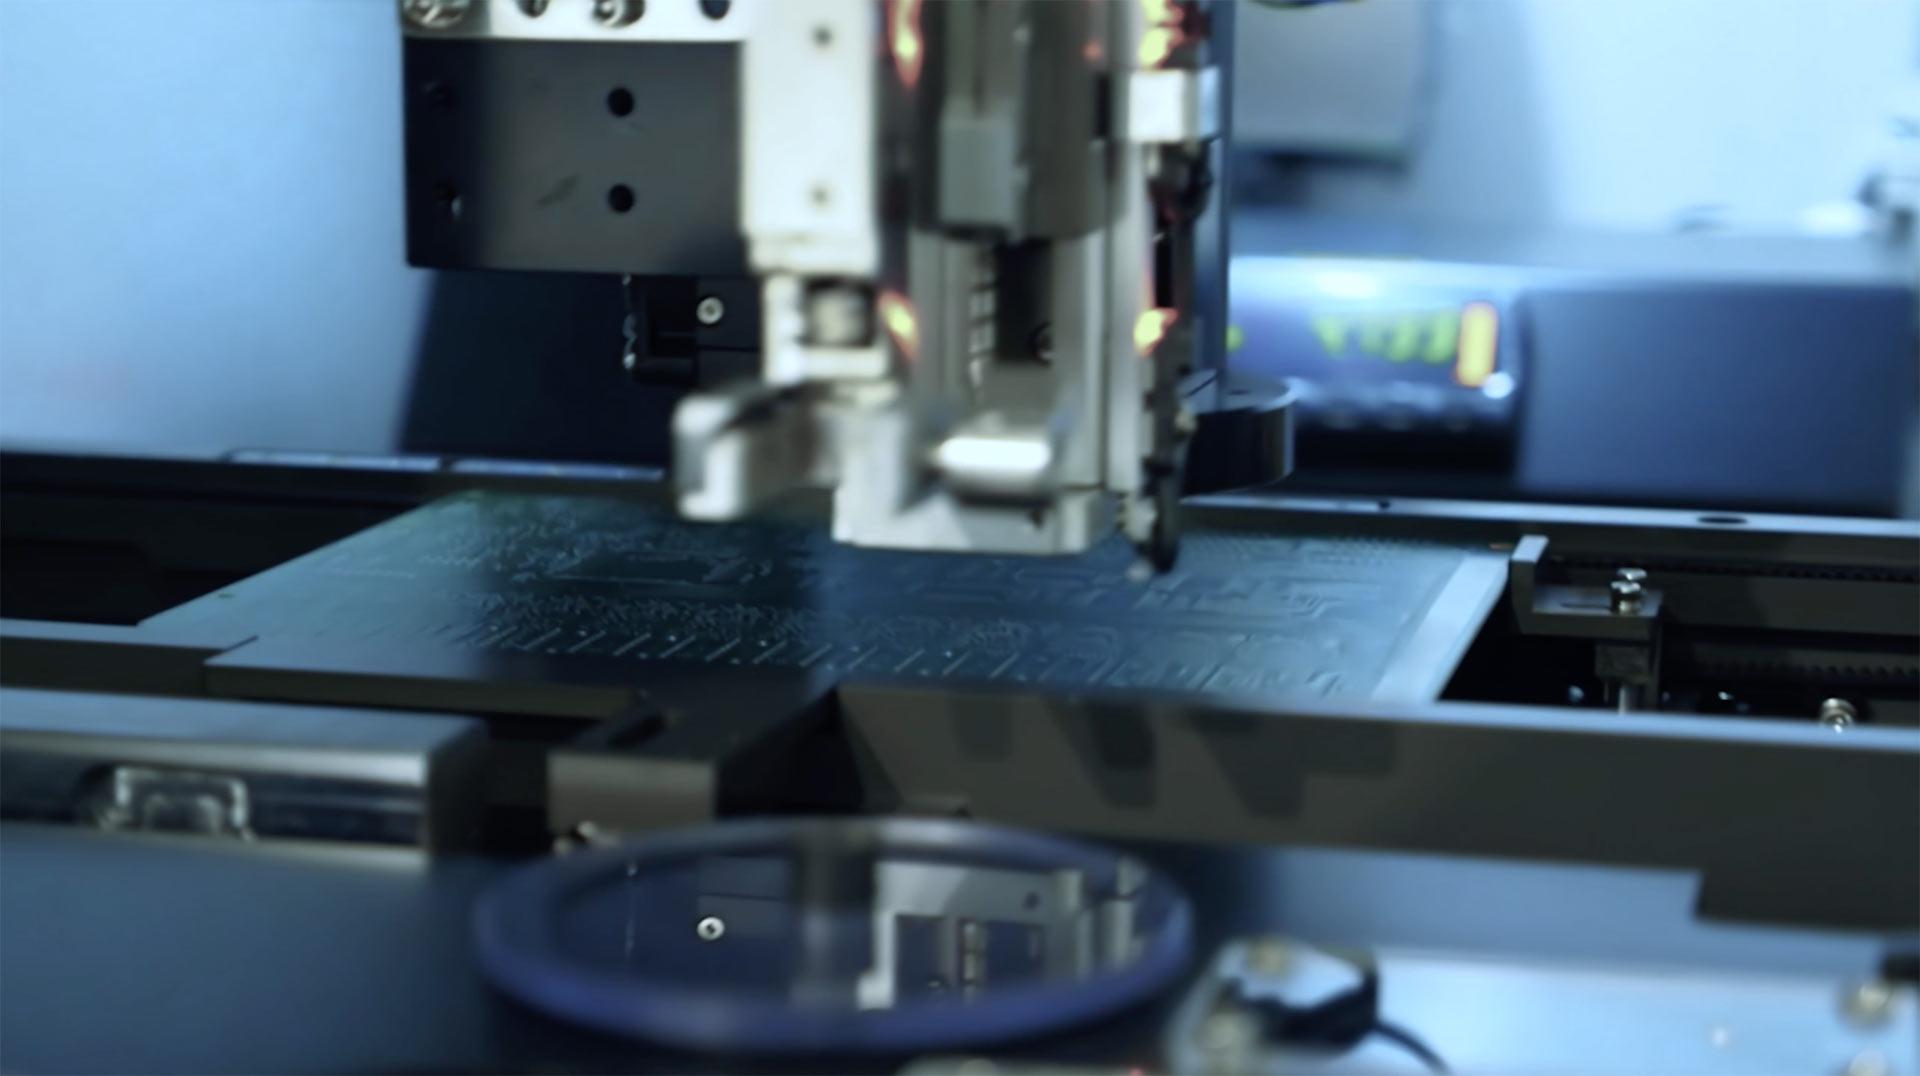 Machine measuring circuit board